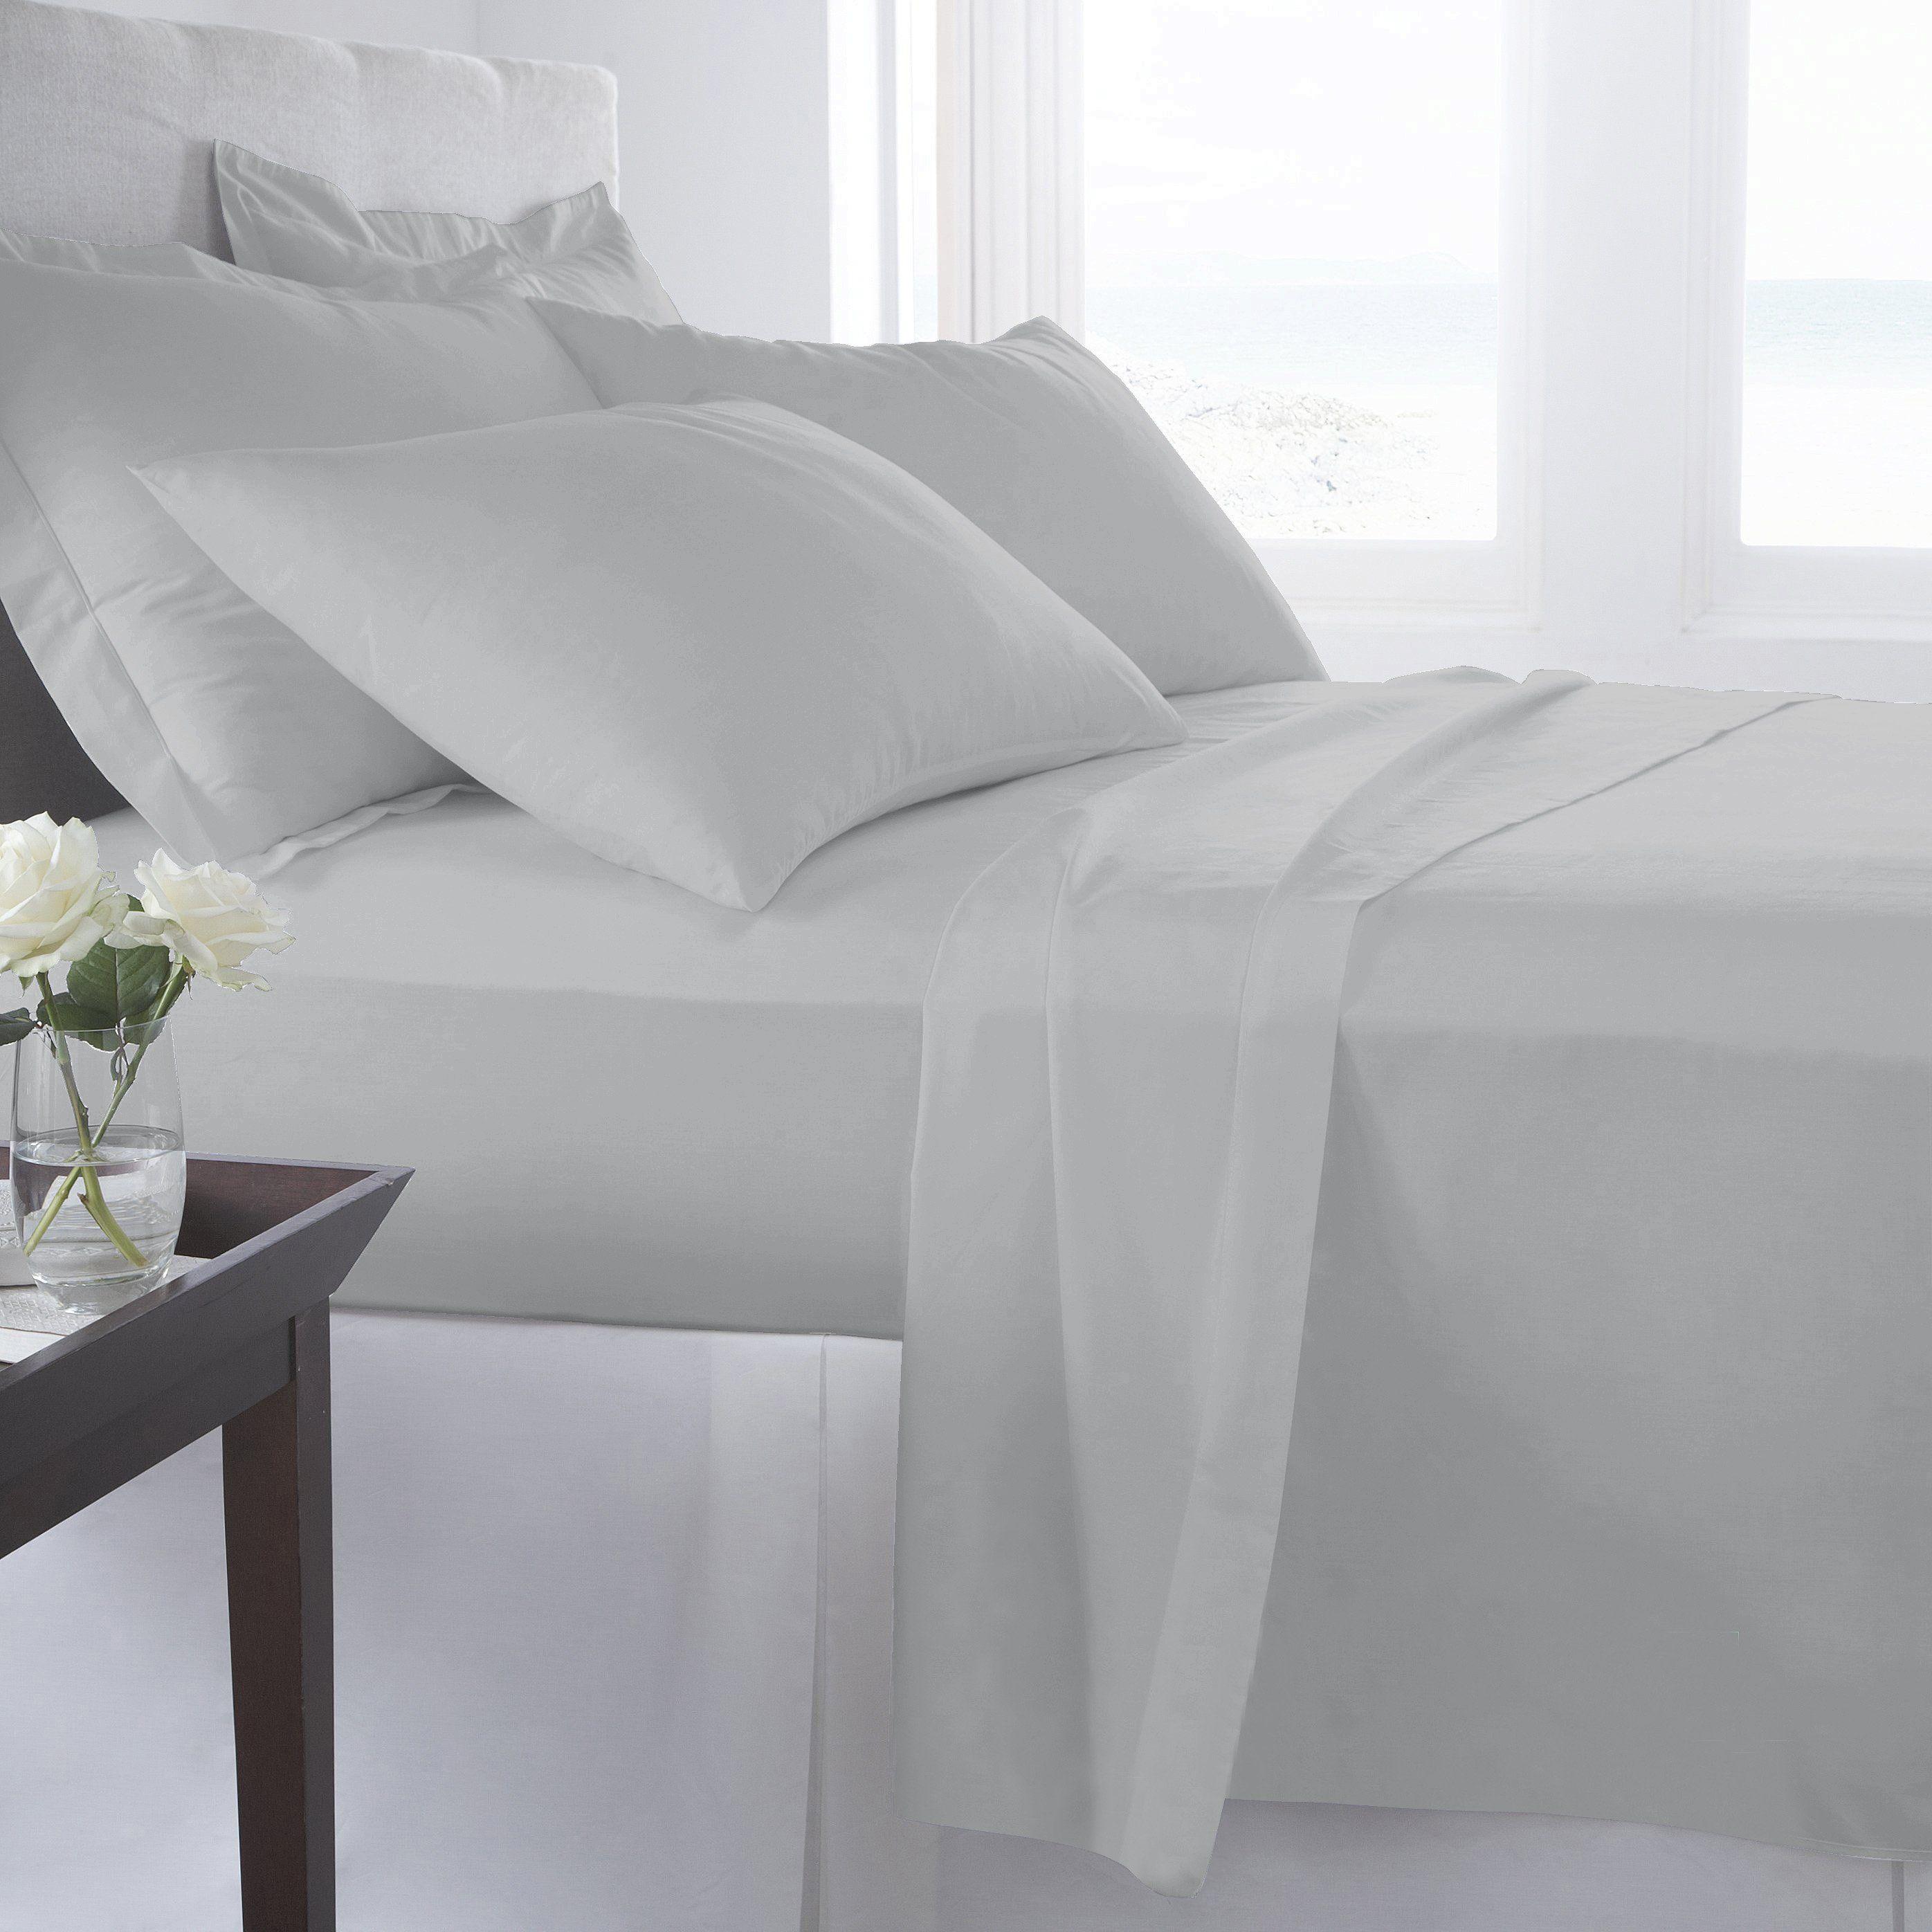 Cotton Sheet Set 1000 Thread Count Bed Sheet Sets Cotton Sheet Sets Sheet Sets